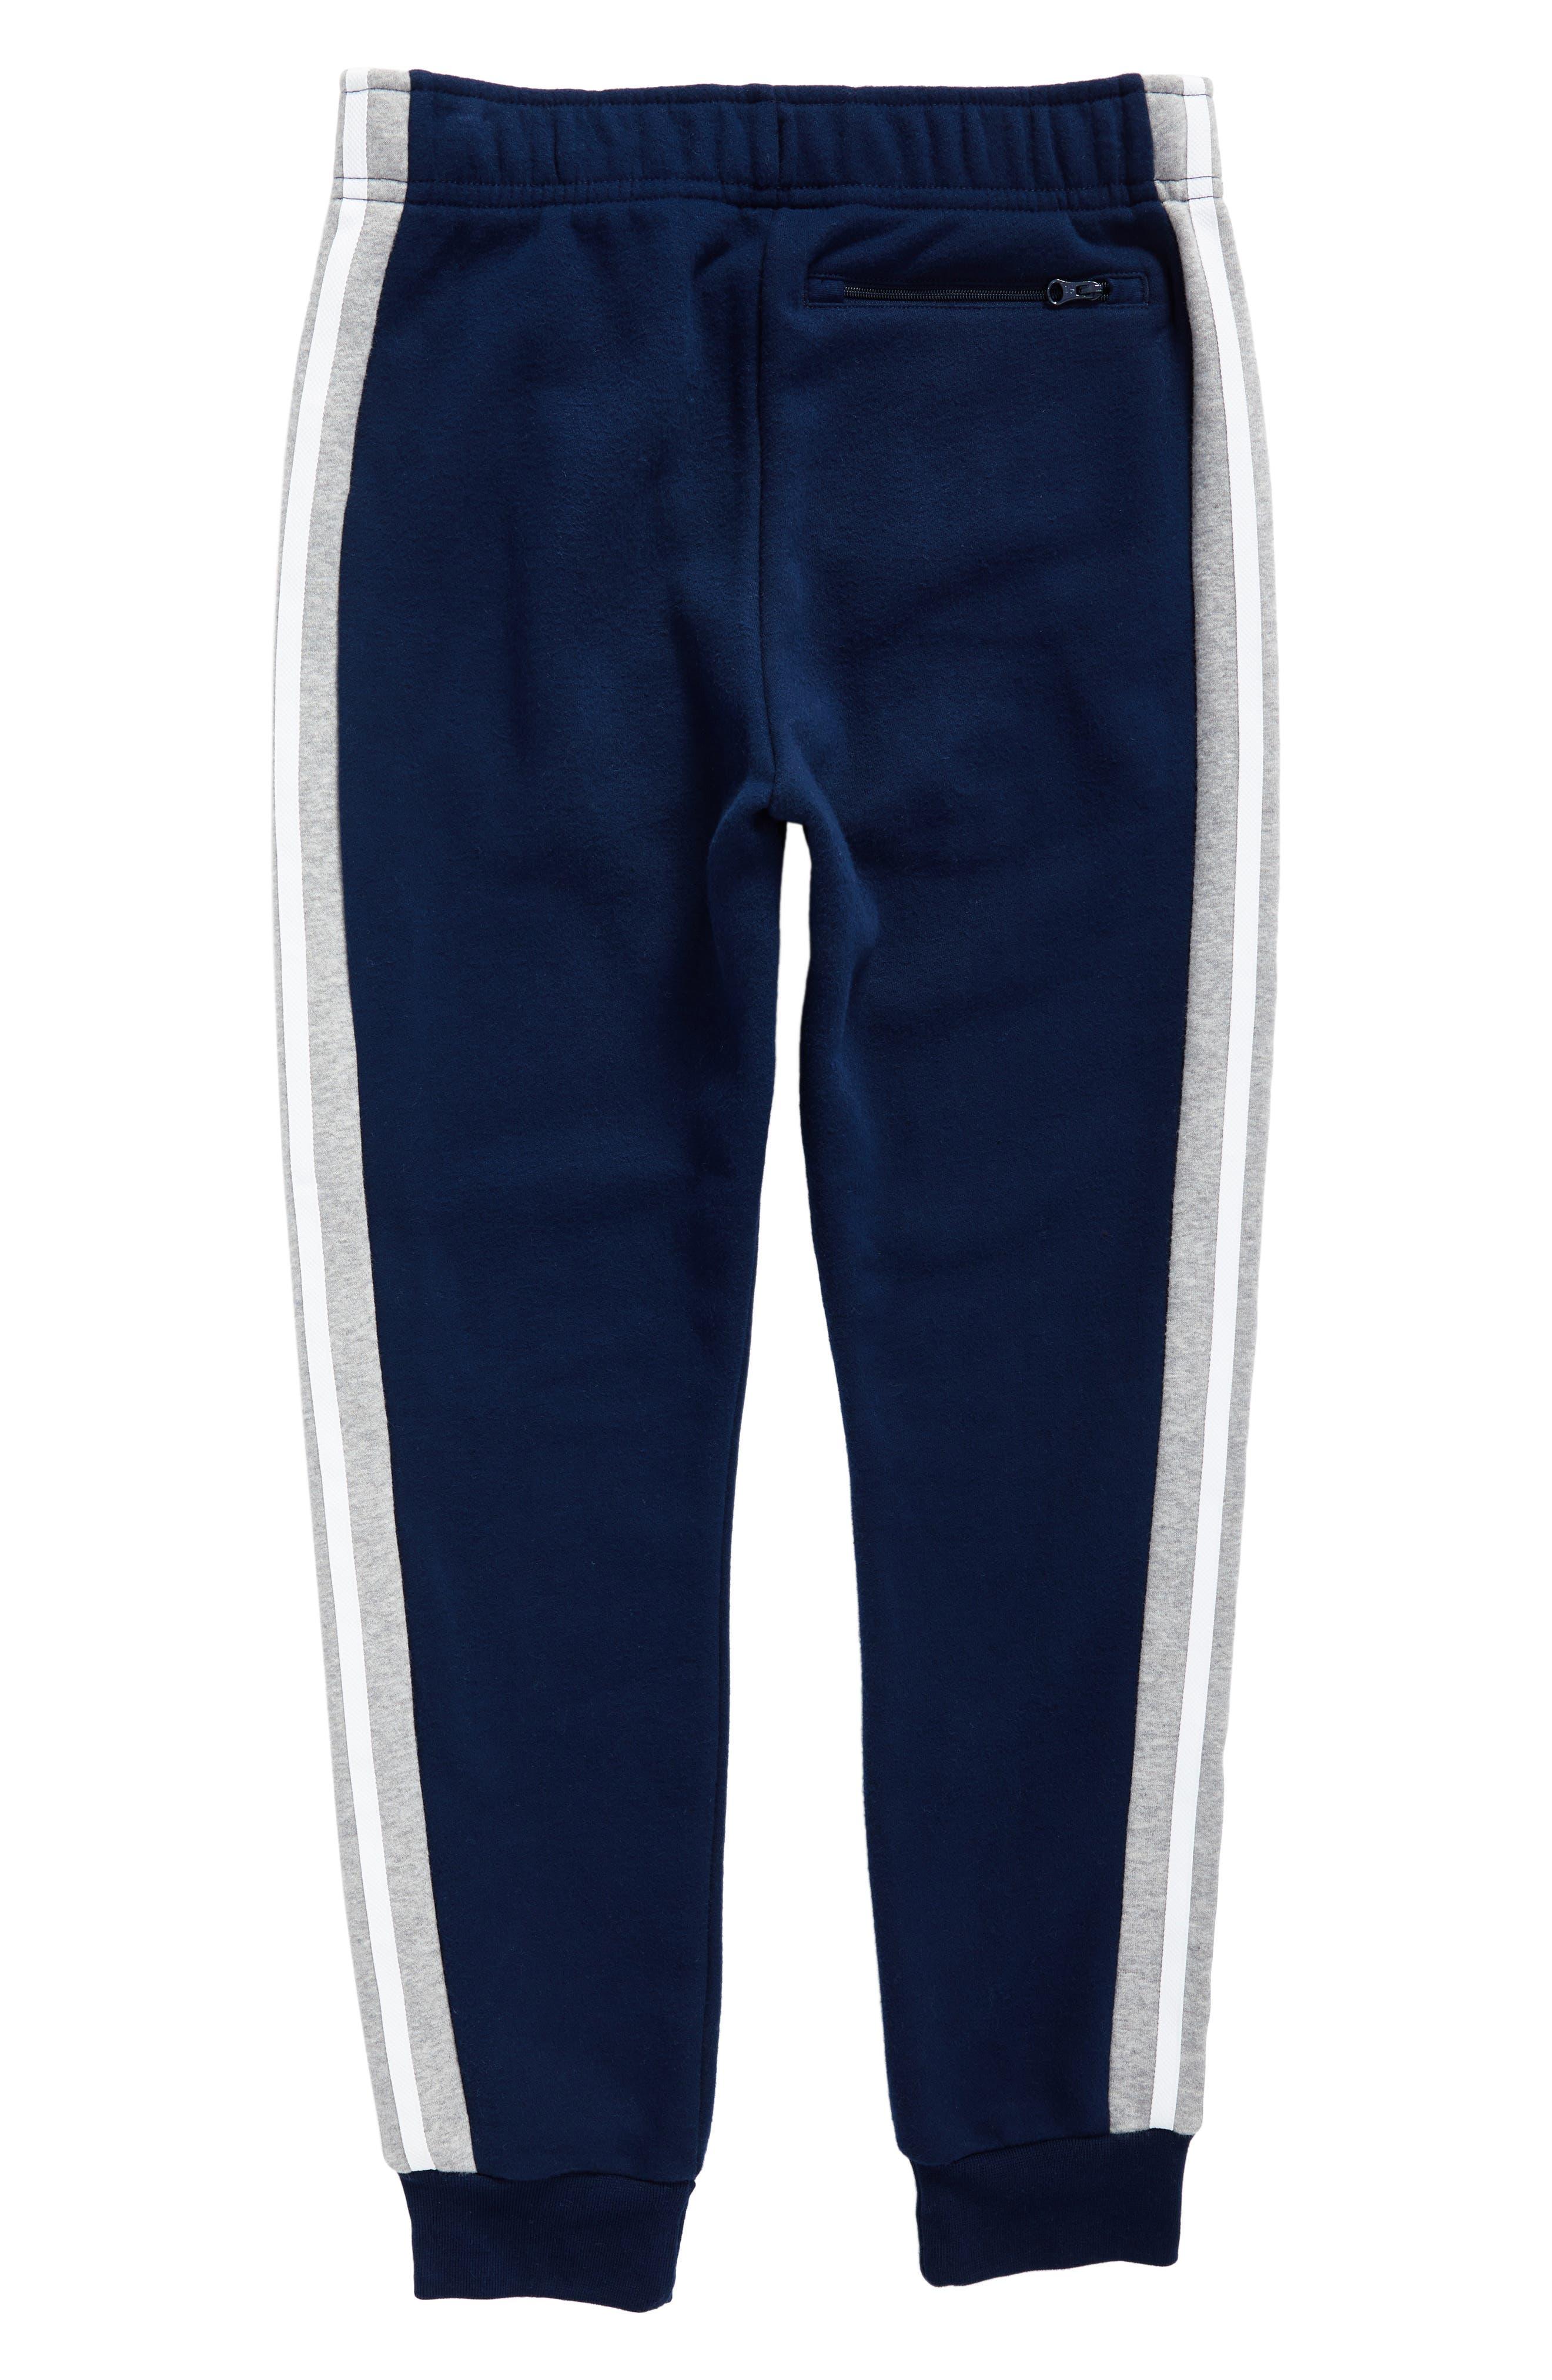 adidas FL Jogger Pants,                             Alternate thumbnail 2, color,                             Collegiate Navy/ Medium Grey